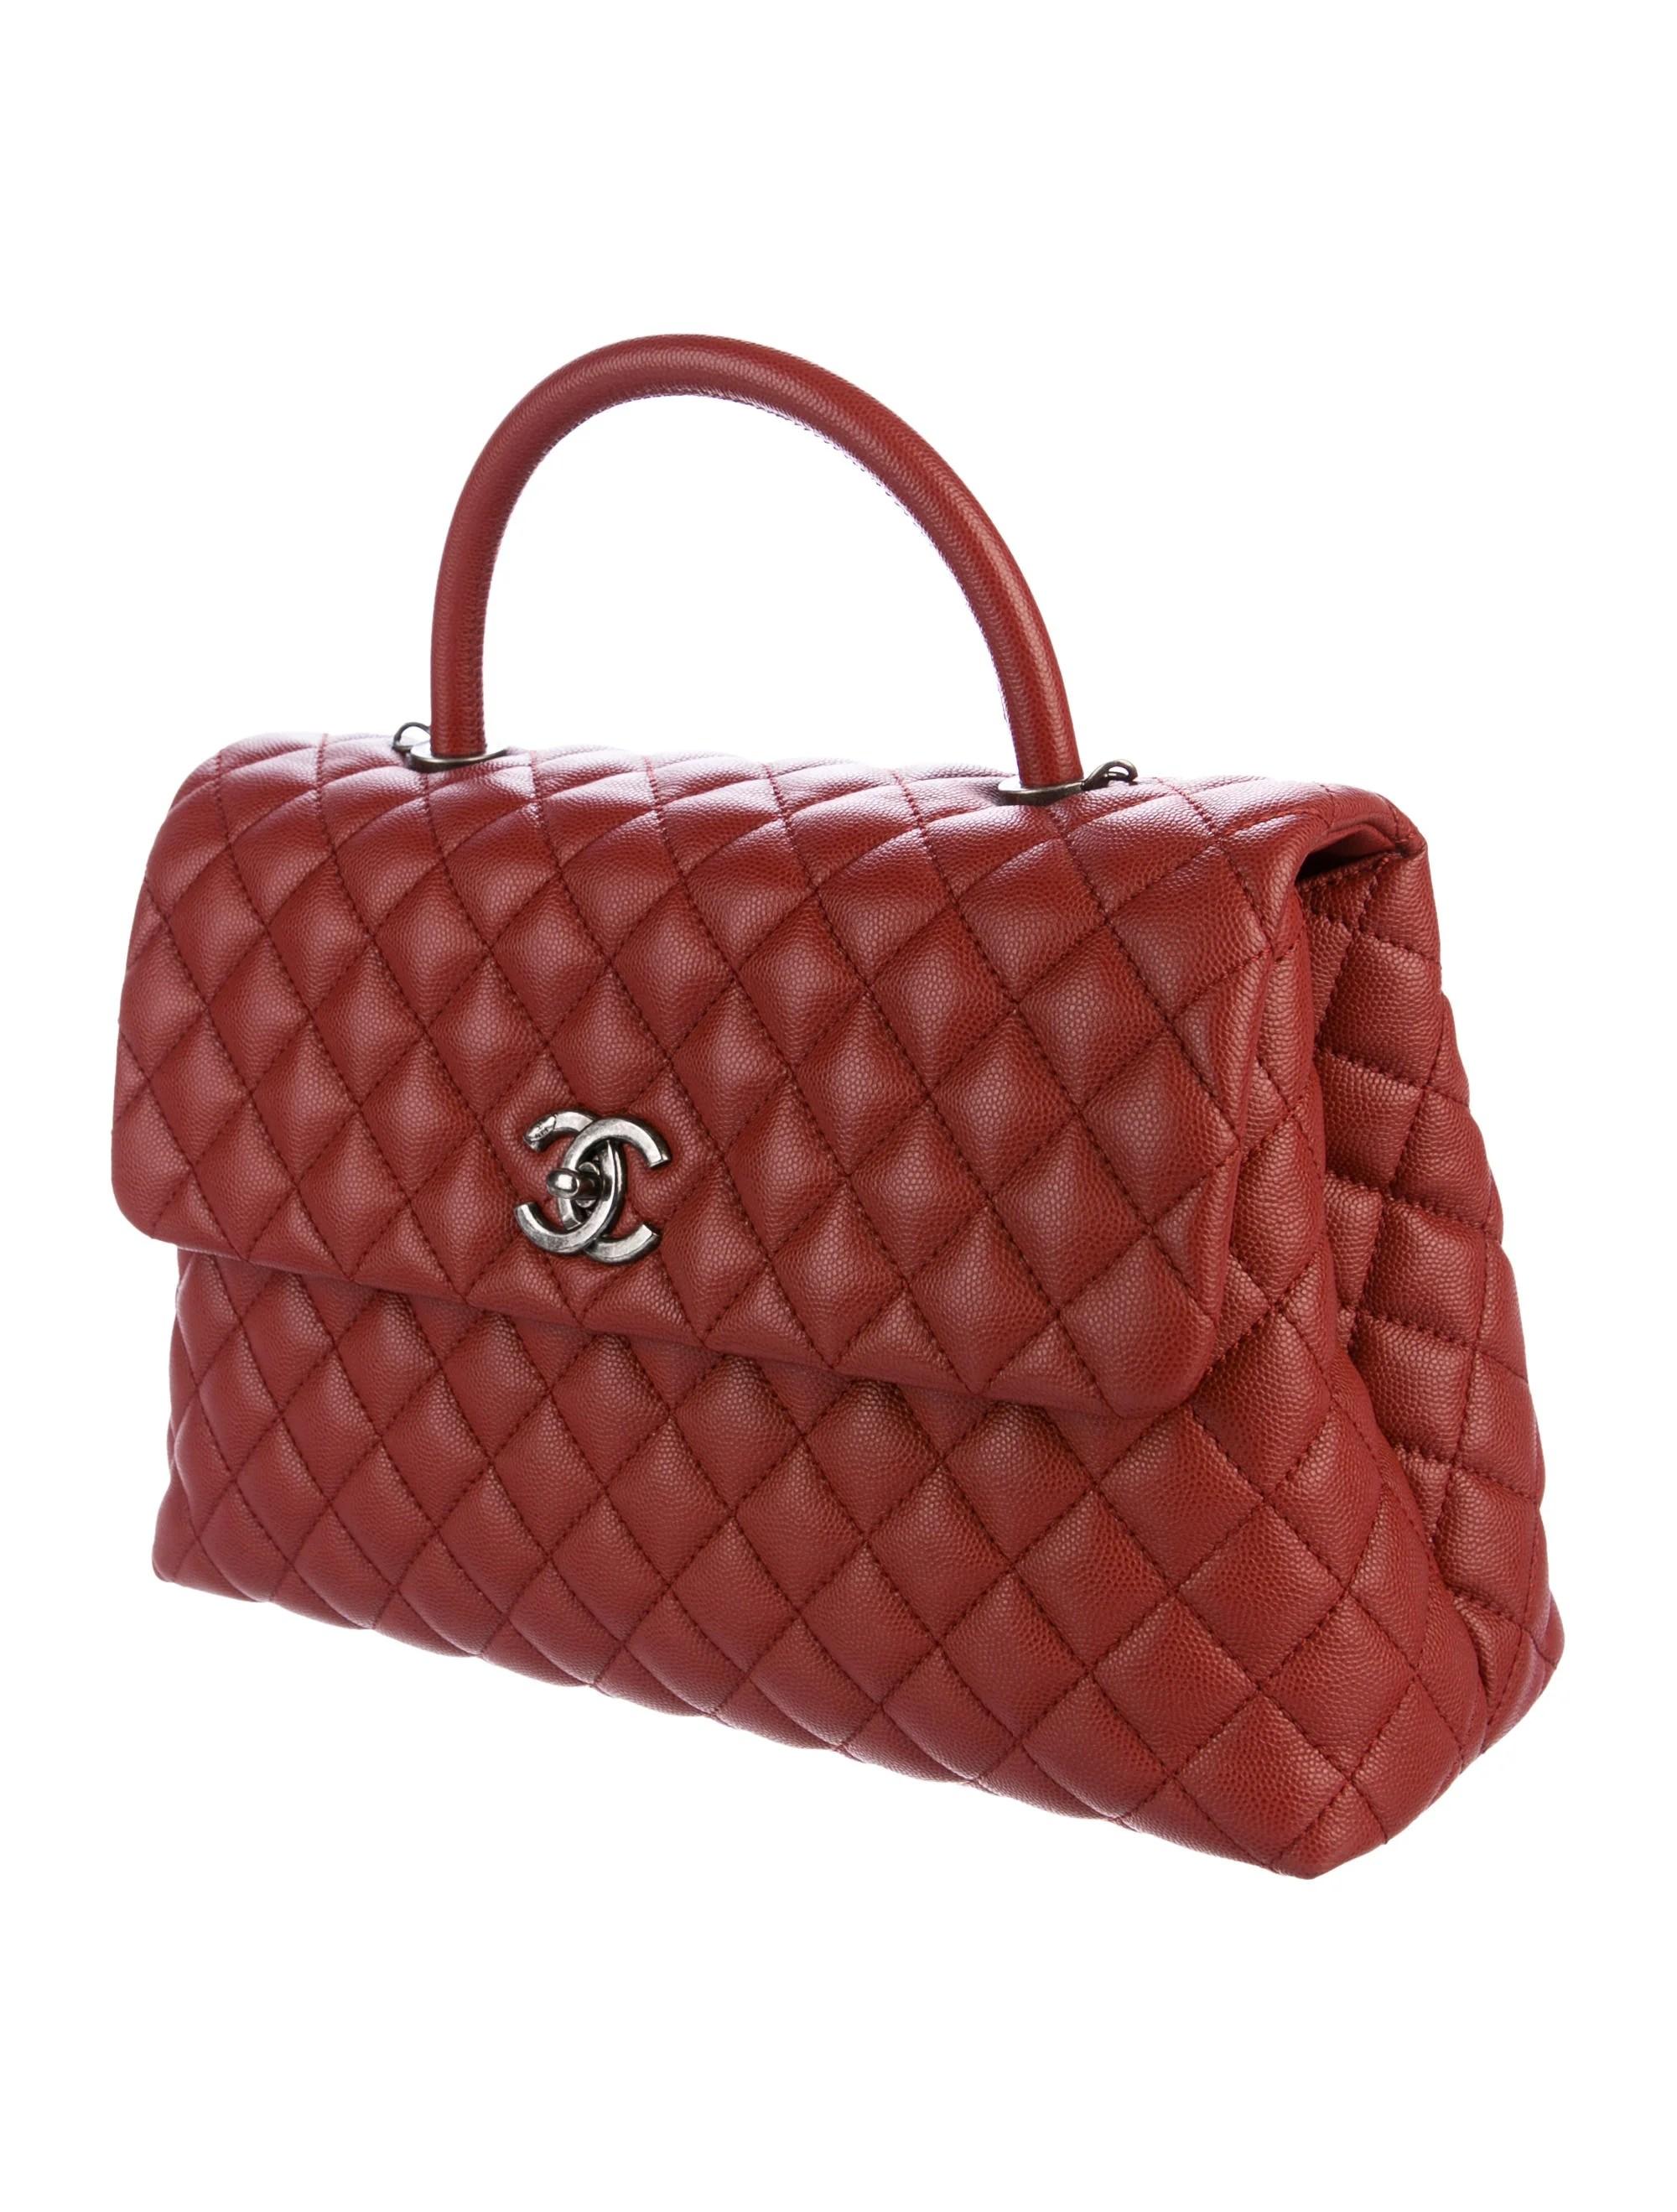 Chanel 2016 Medium Coco Handle Bag - Handbags - CHA202246 ...